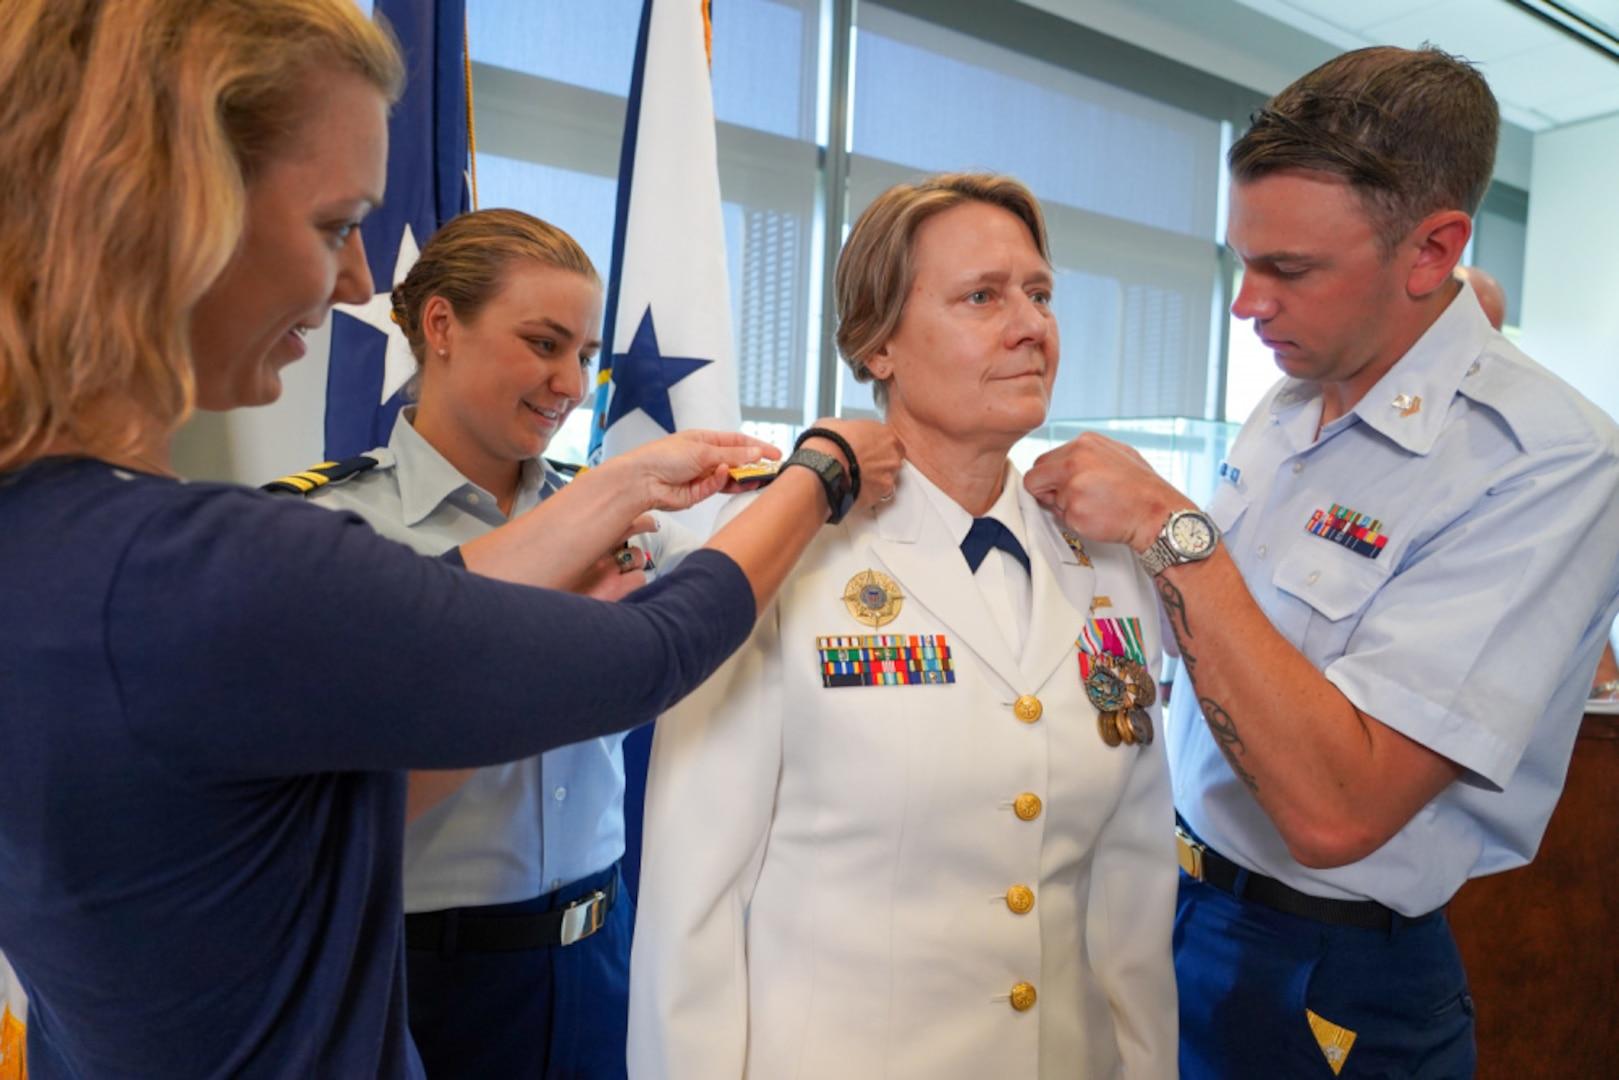 Vice Adm. Linda Fagan promoted to rank of admiral